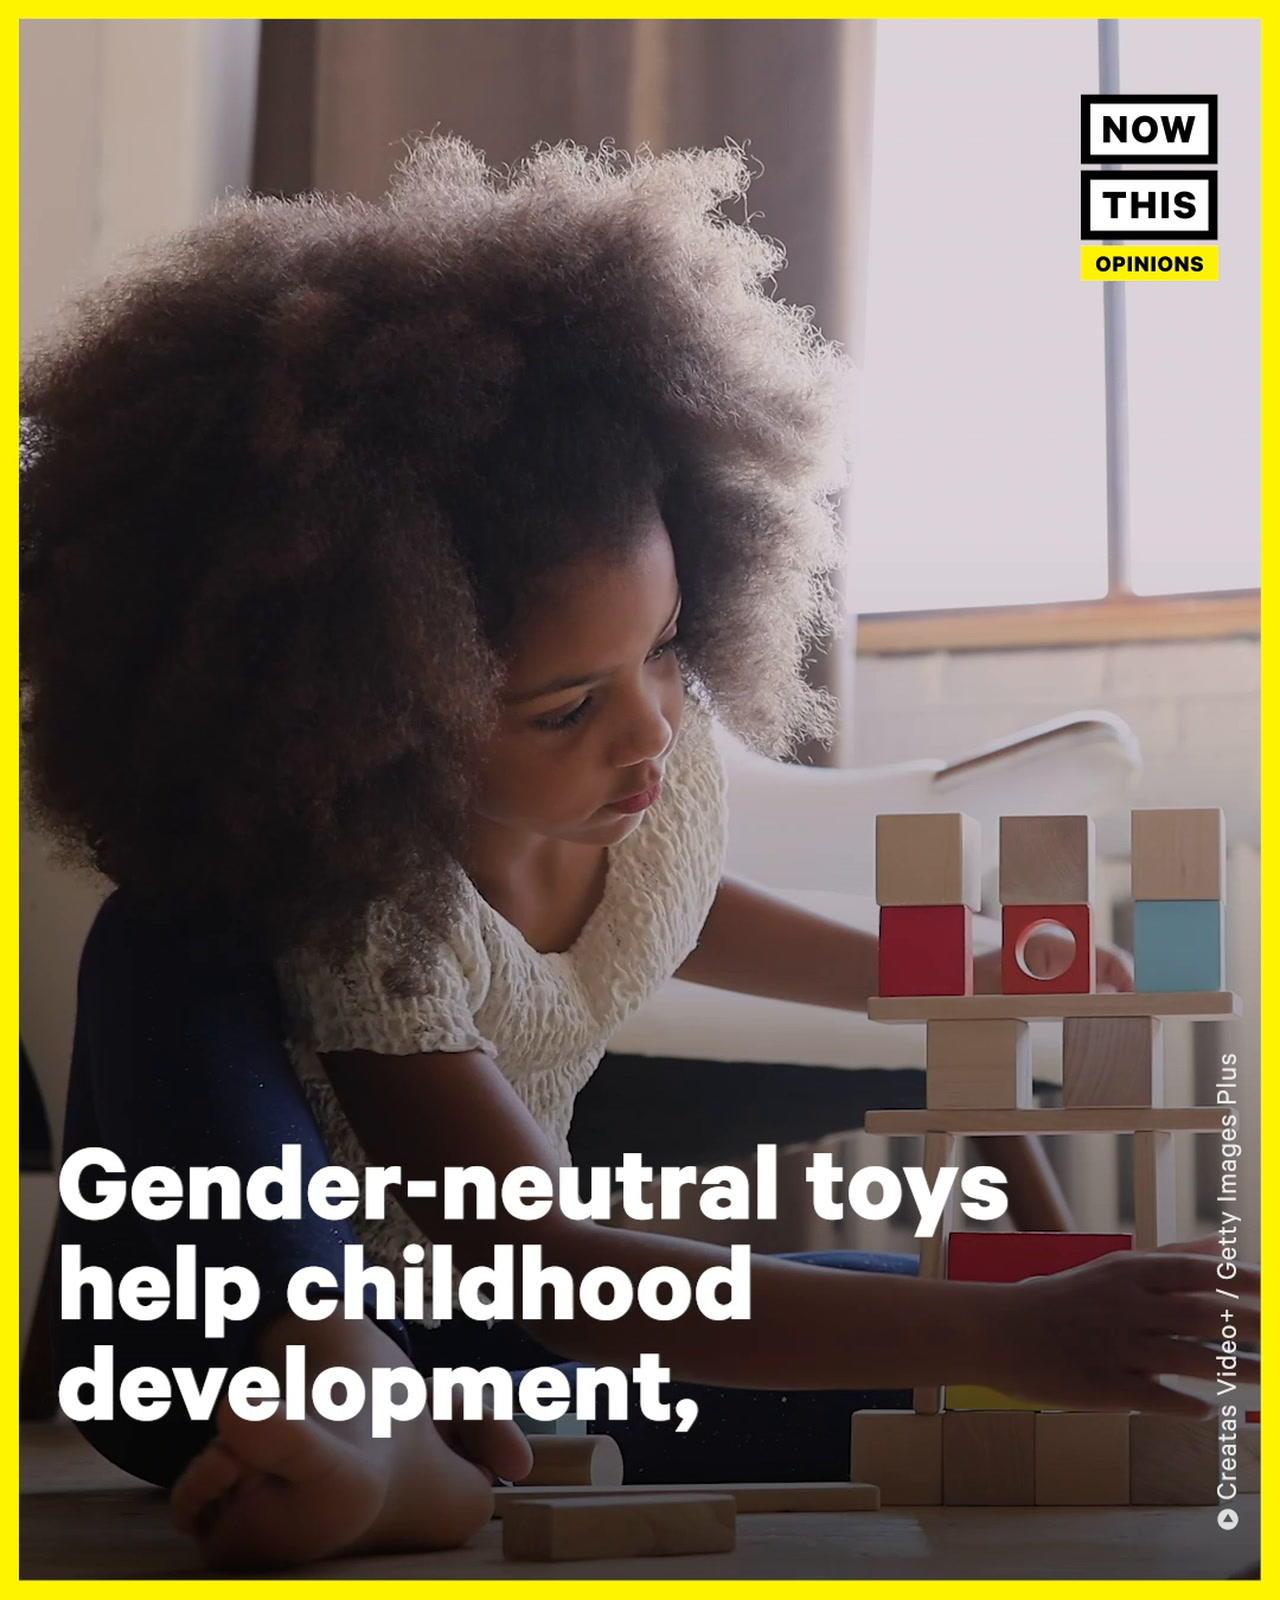 Development Psychologist Breaks Down Benefits of Gender Neutral Toys